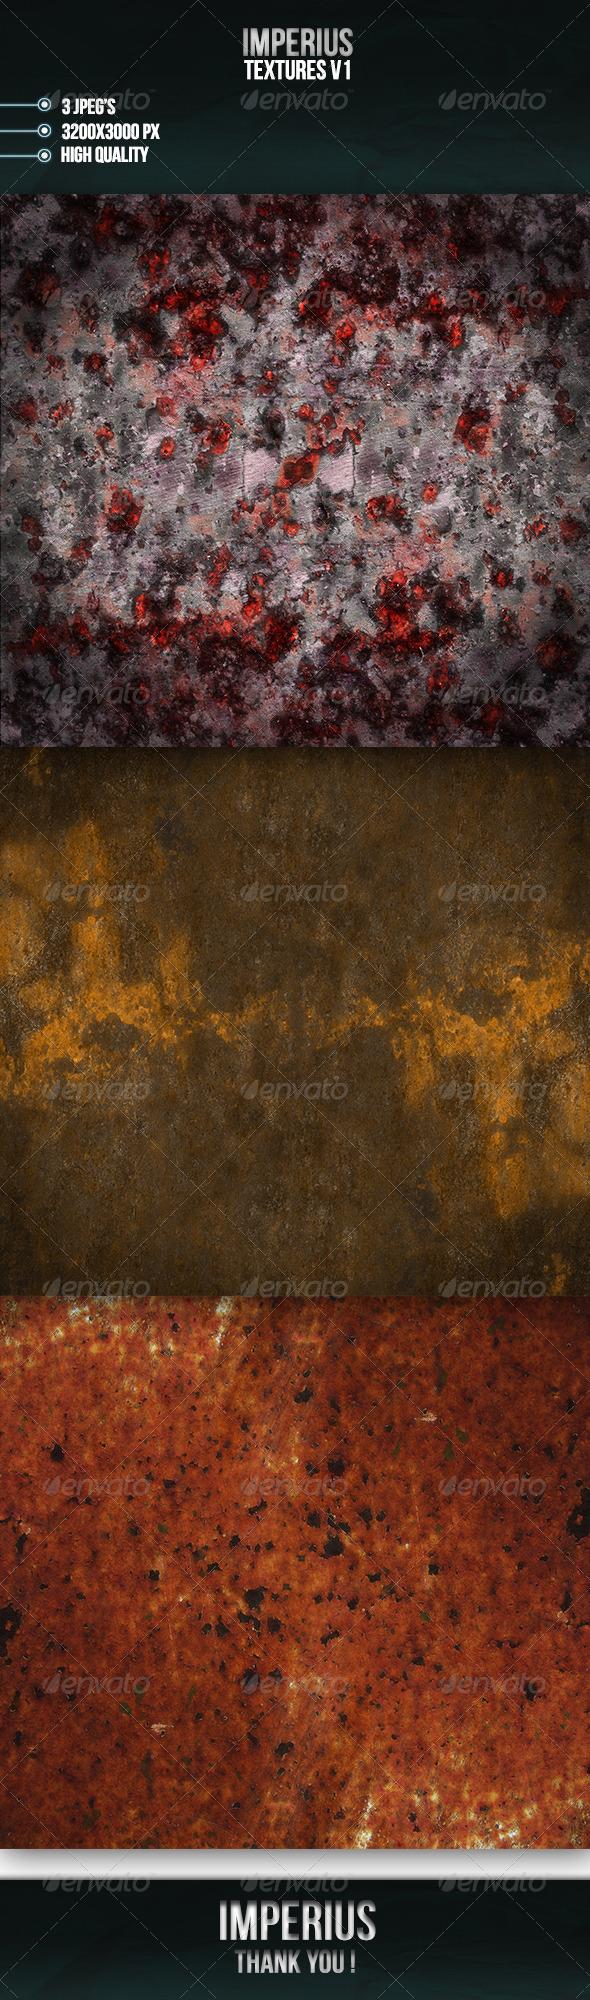 Textures V1 - Textures